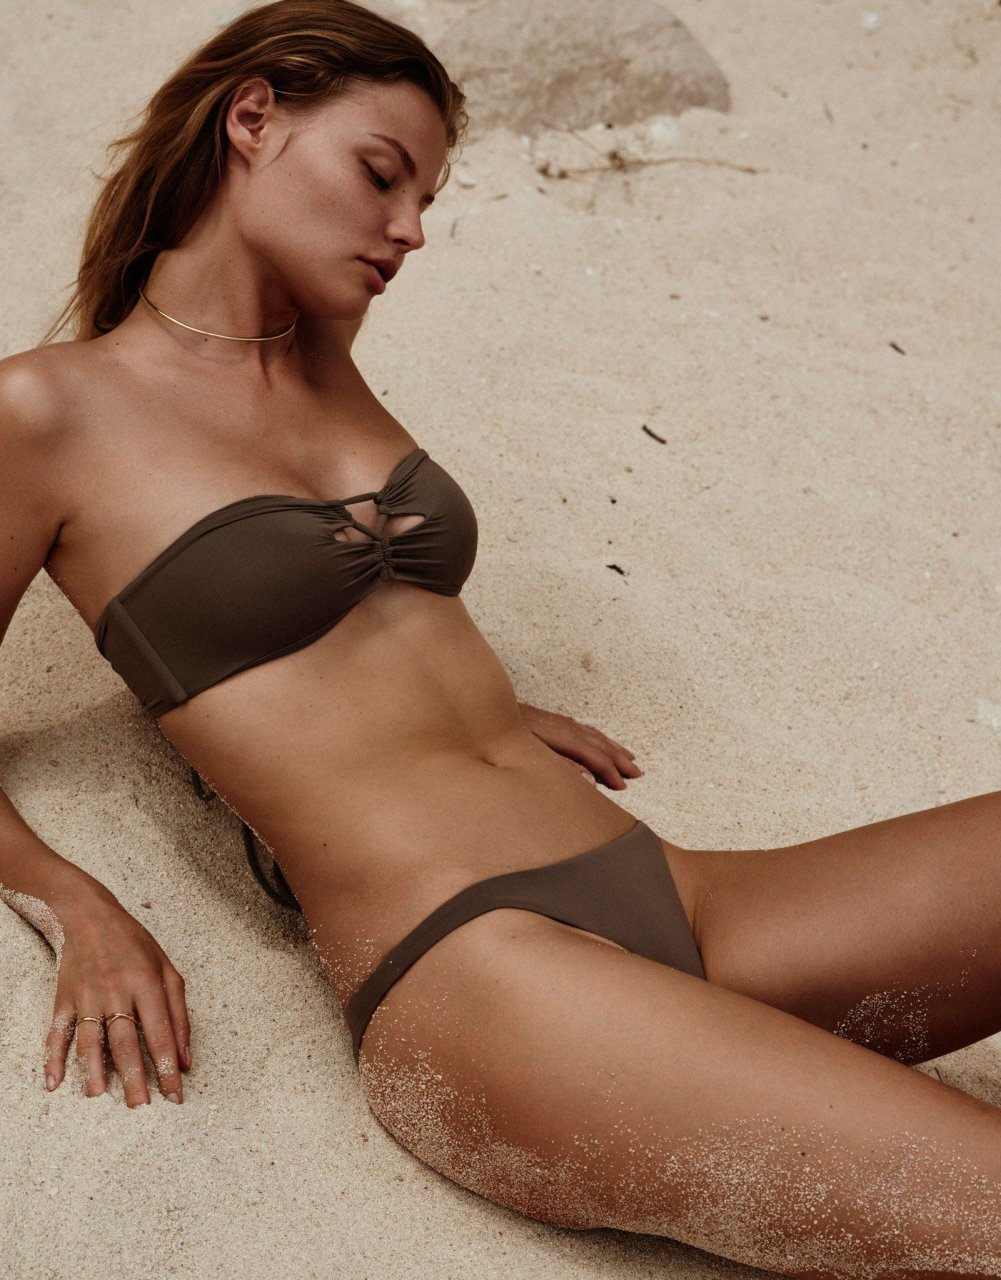 Magdalena holland nude